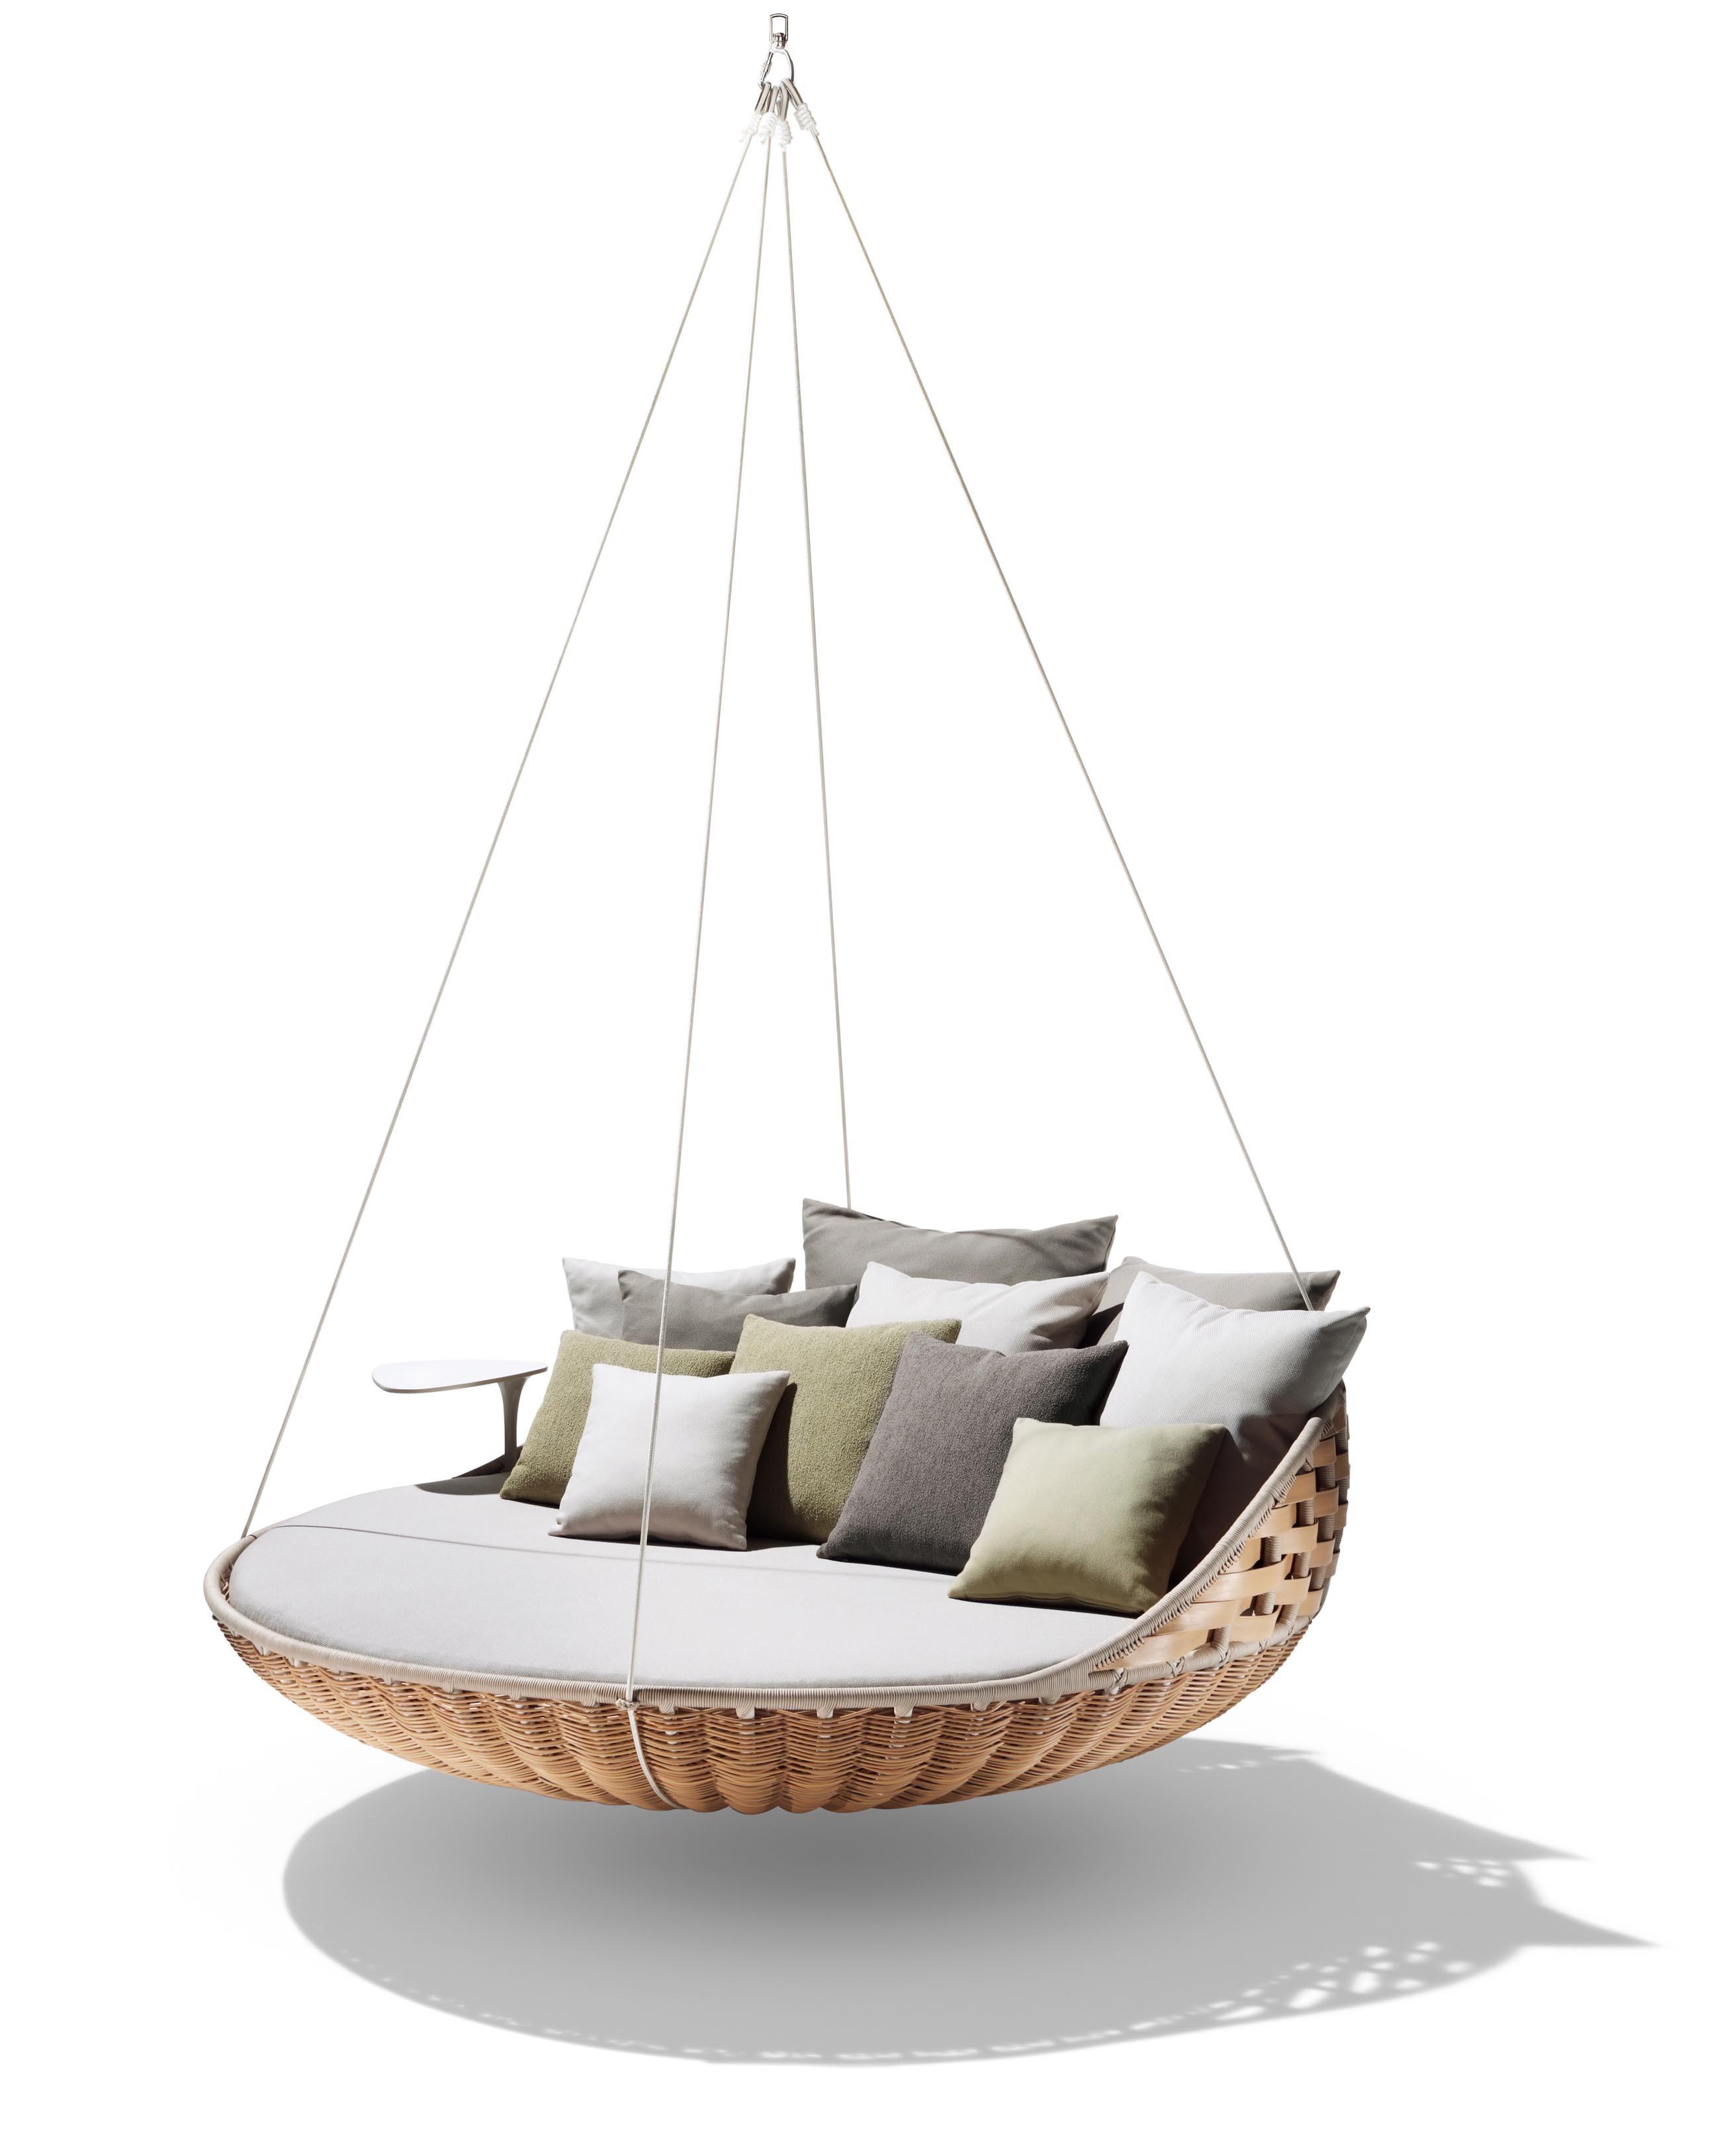 Buy The Dedon Swingrest Hanging Lounger Sofa At Deplaincom